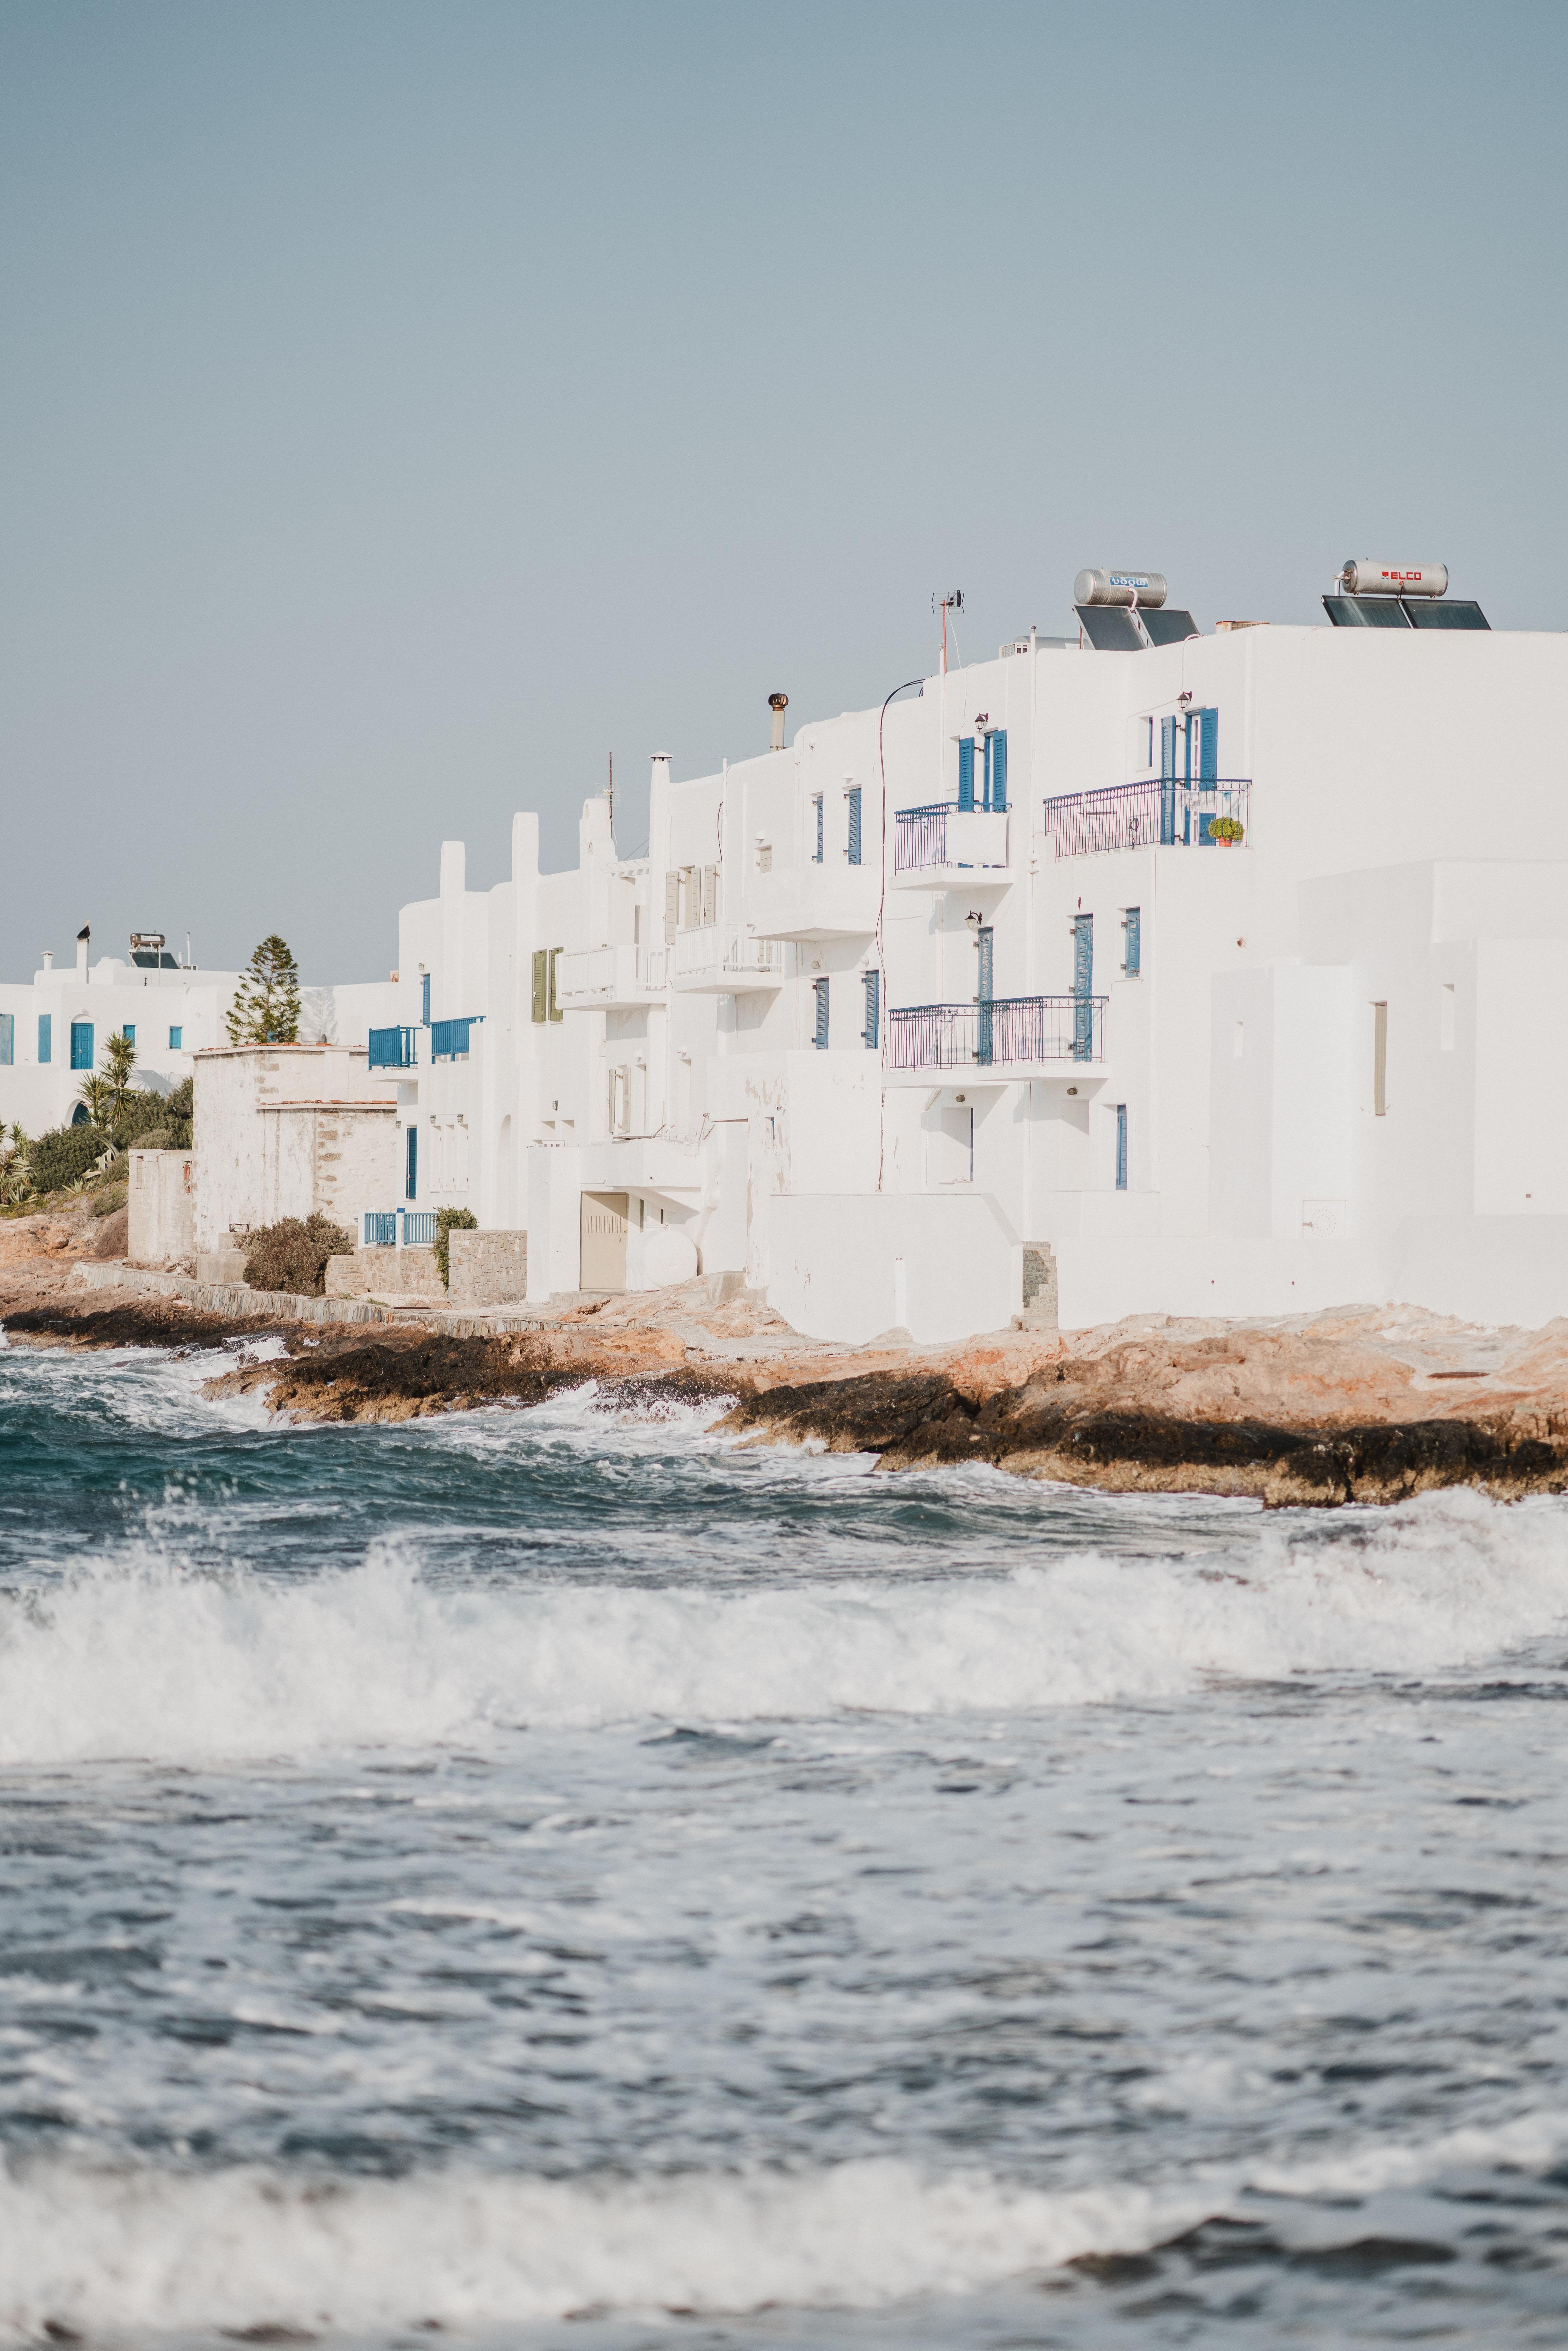 sea waves crashing on shore with house